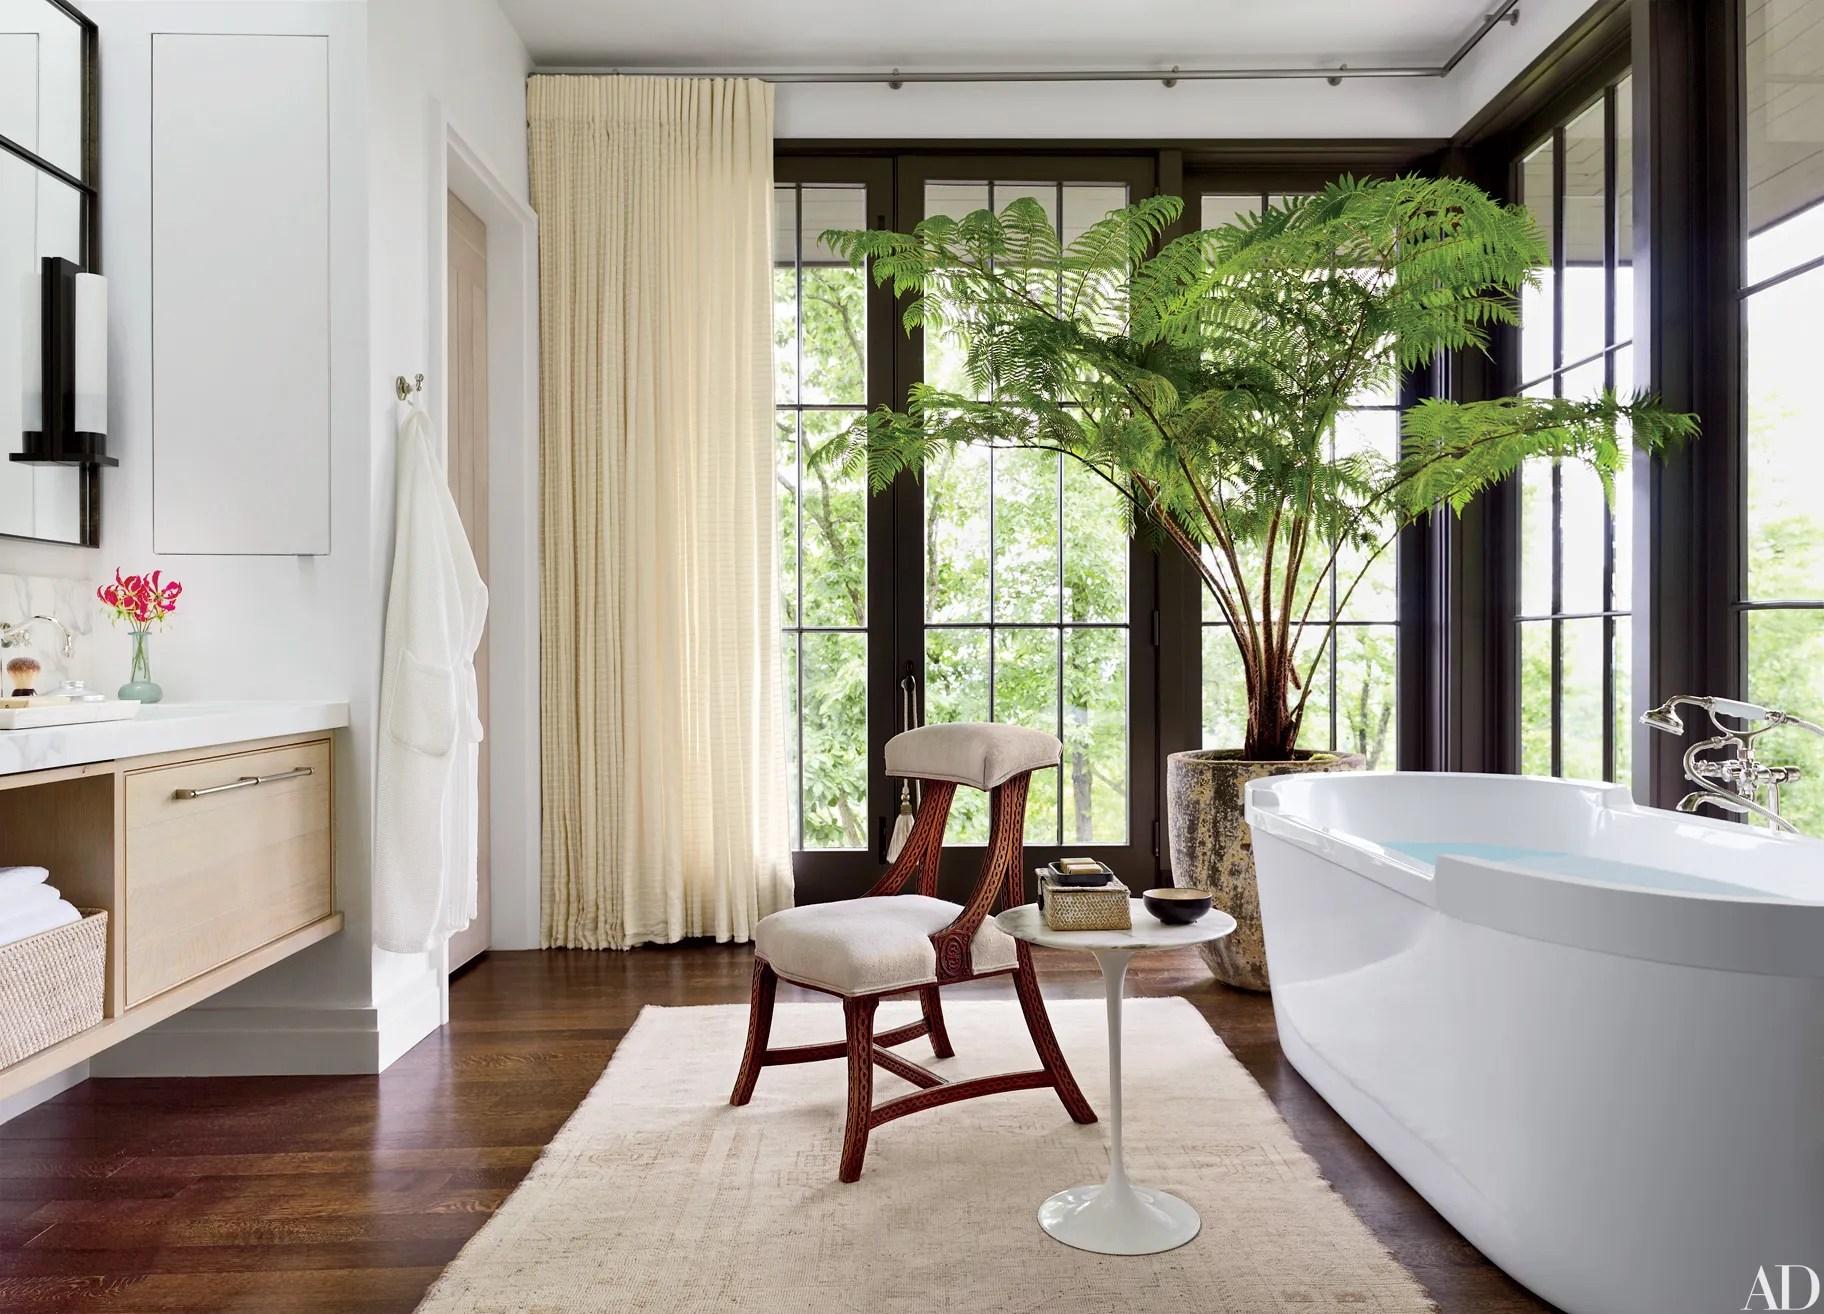 46 Bathroom Design Ideas To Inspire Your Next Renovation